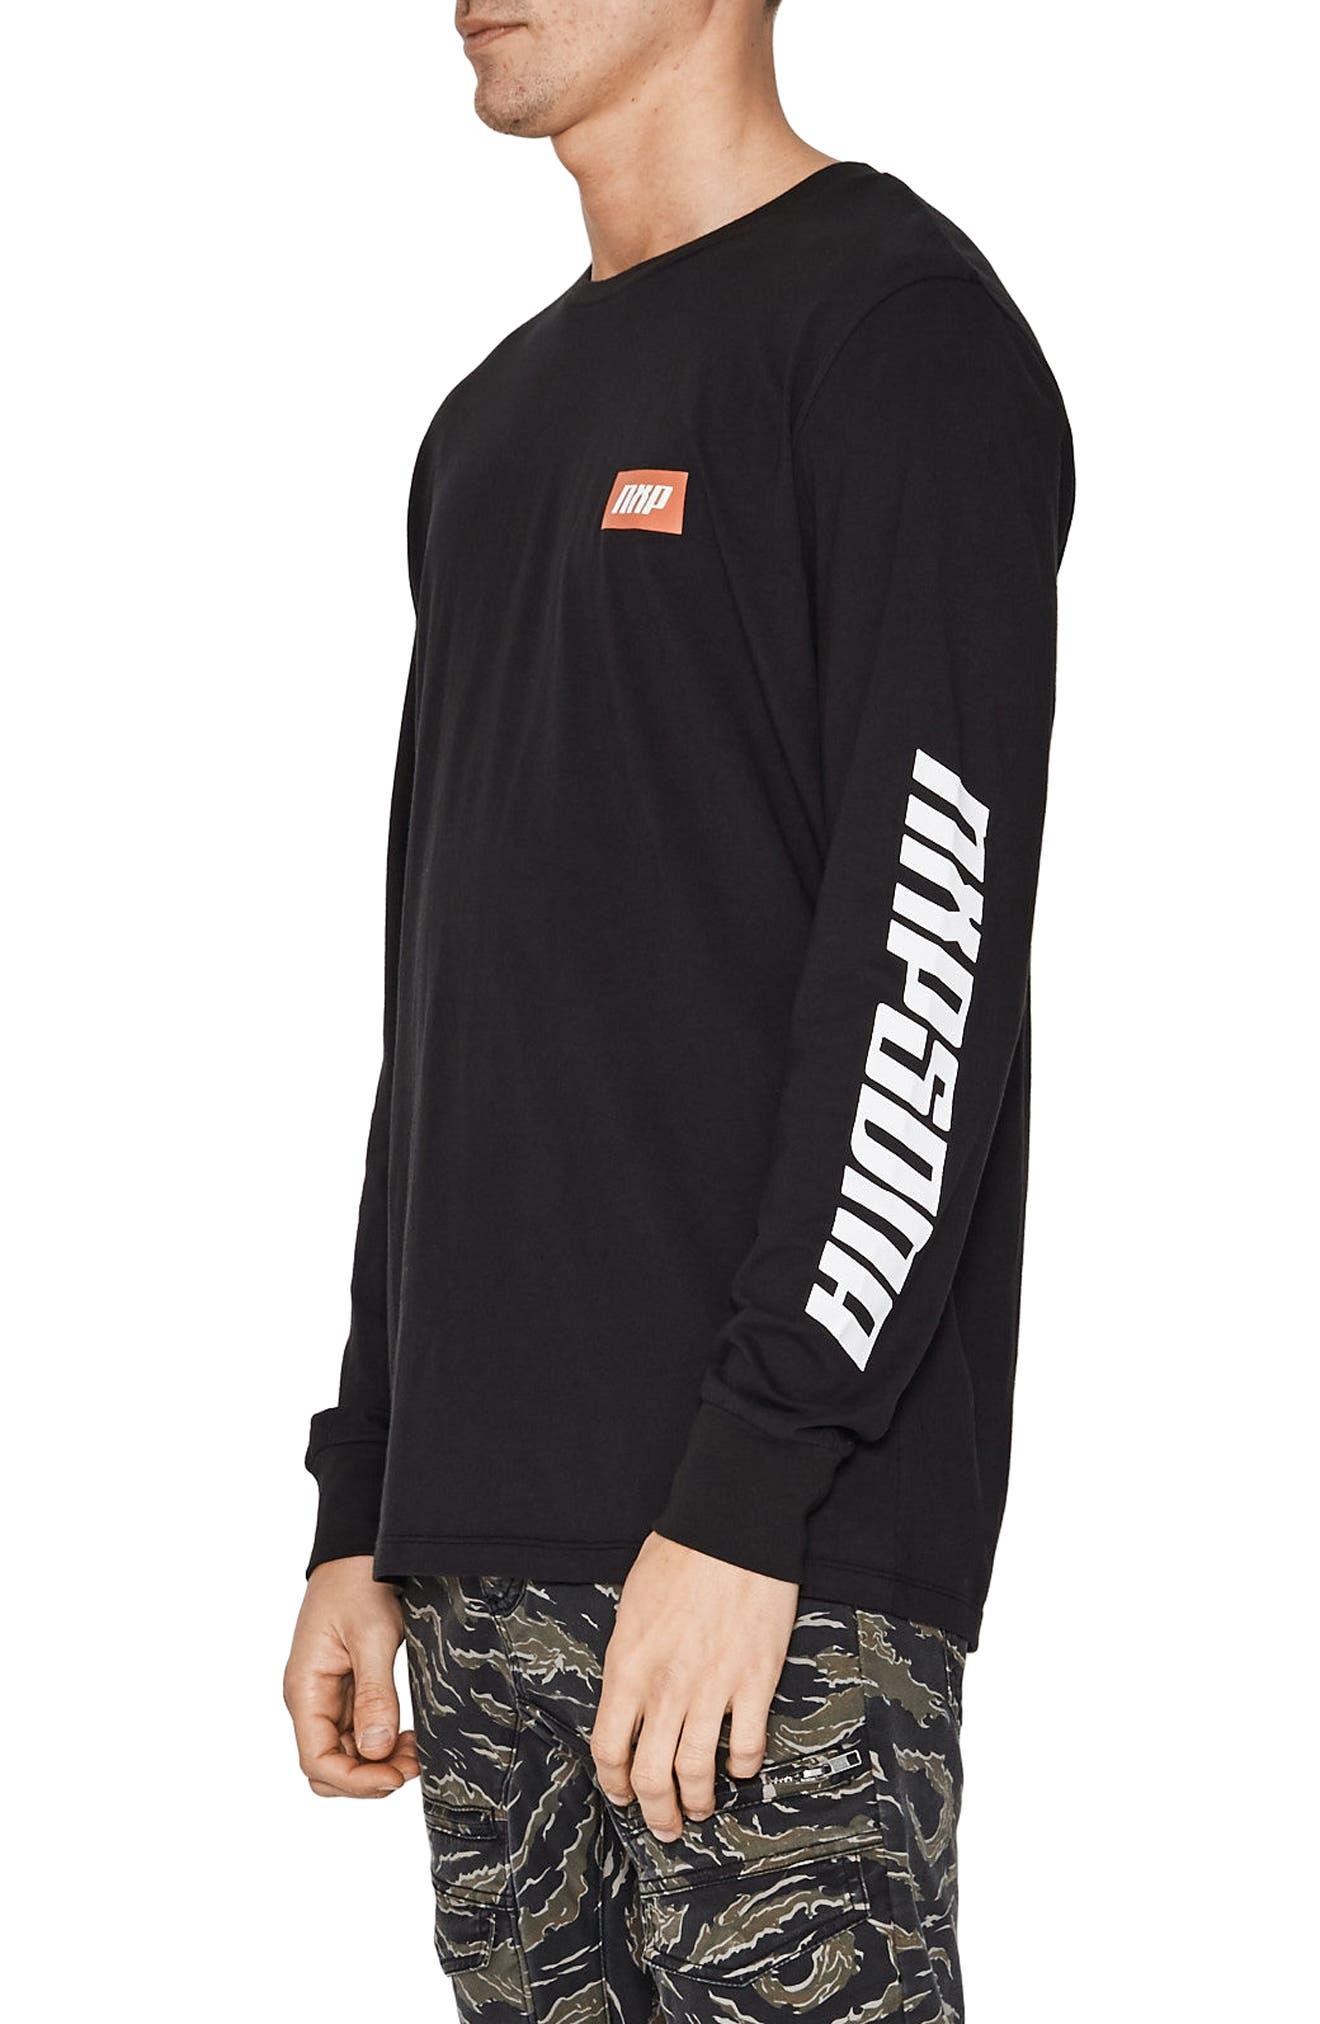 Ultimate Power T-Shirt,                             Alternate thumbnail 3, color,                             Jet Black